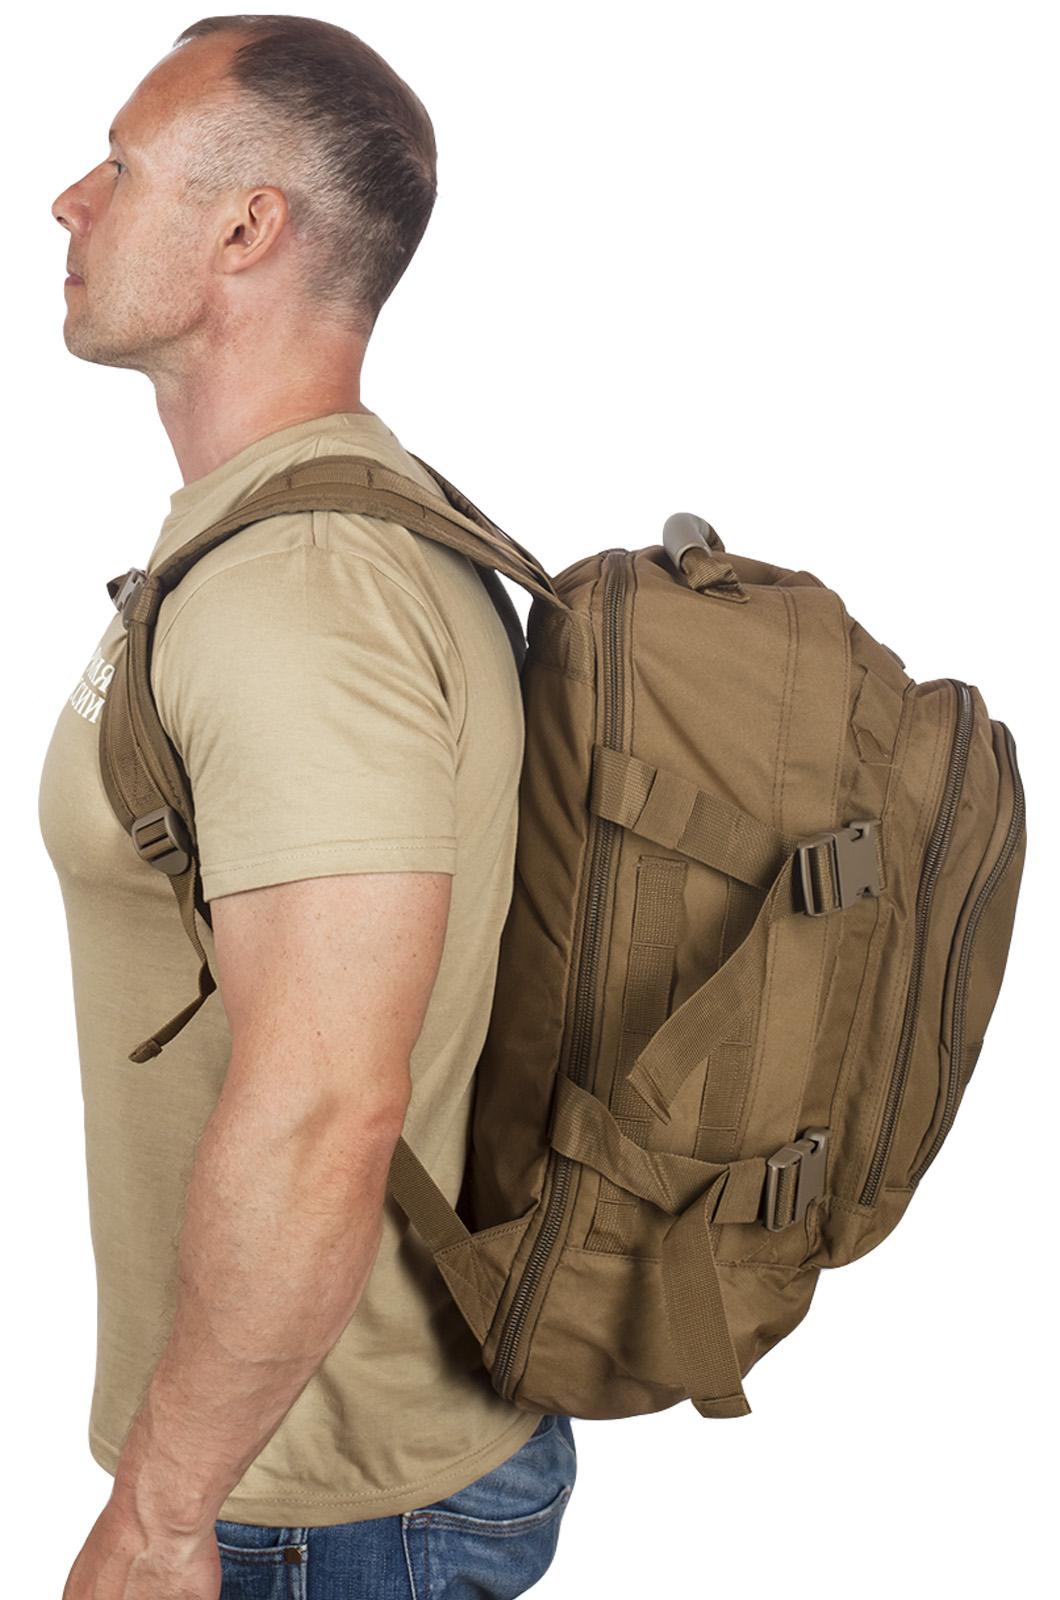 Заказать патрульный трехдневный рюкзак 3-Day Expandable Backpack 08002B Coyote